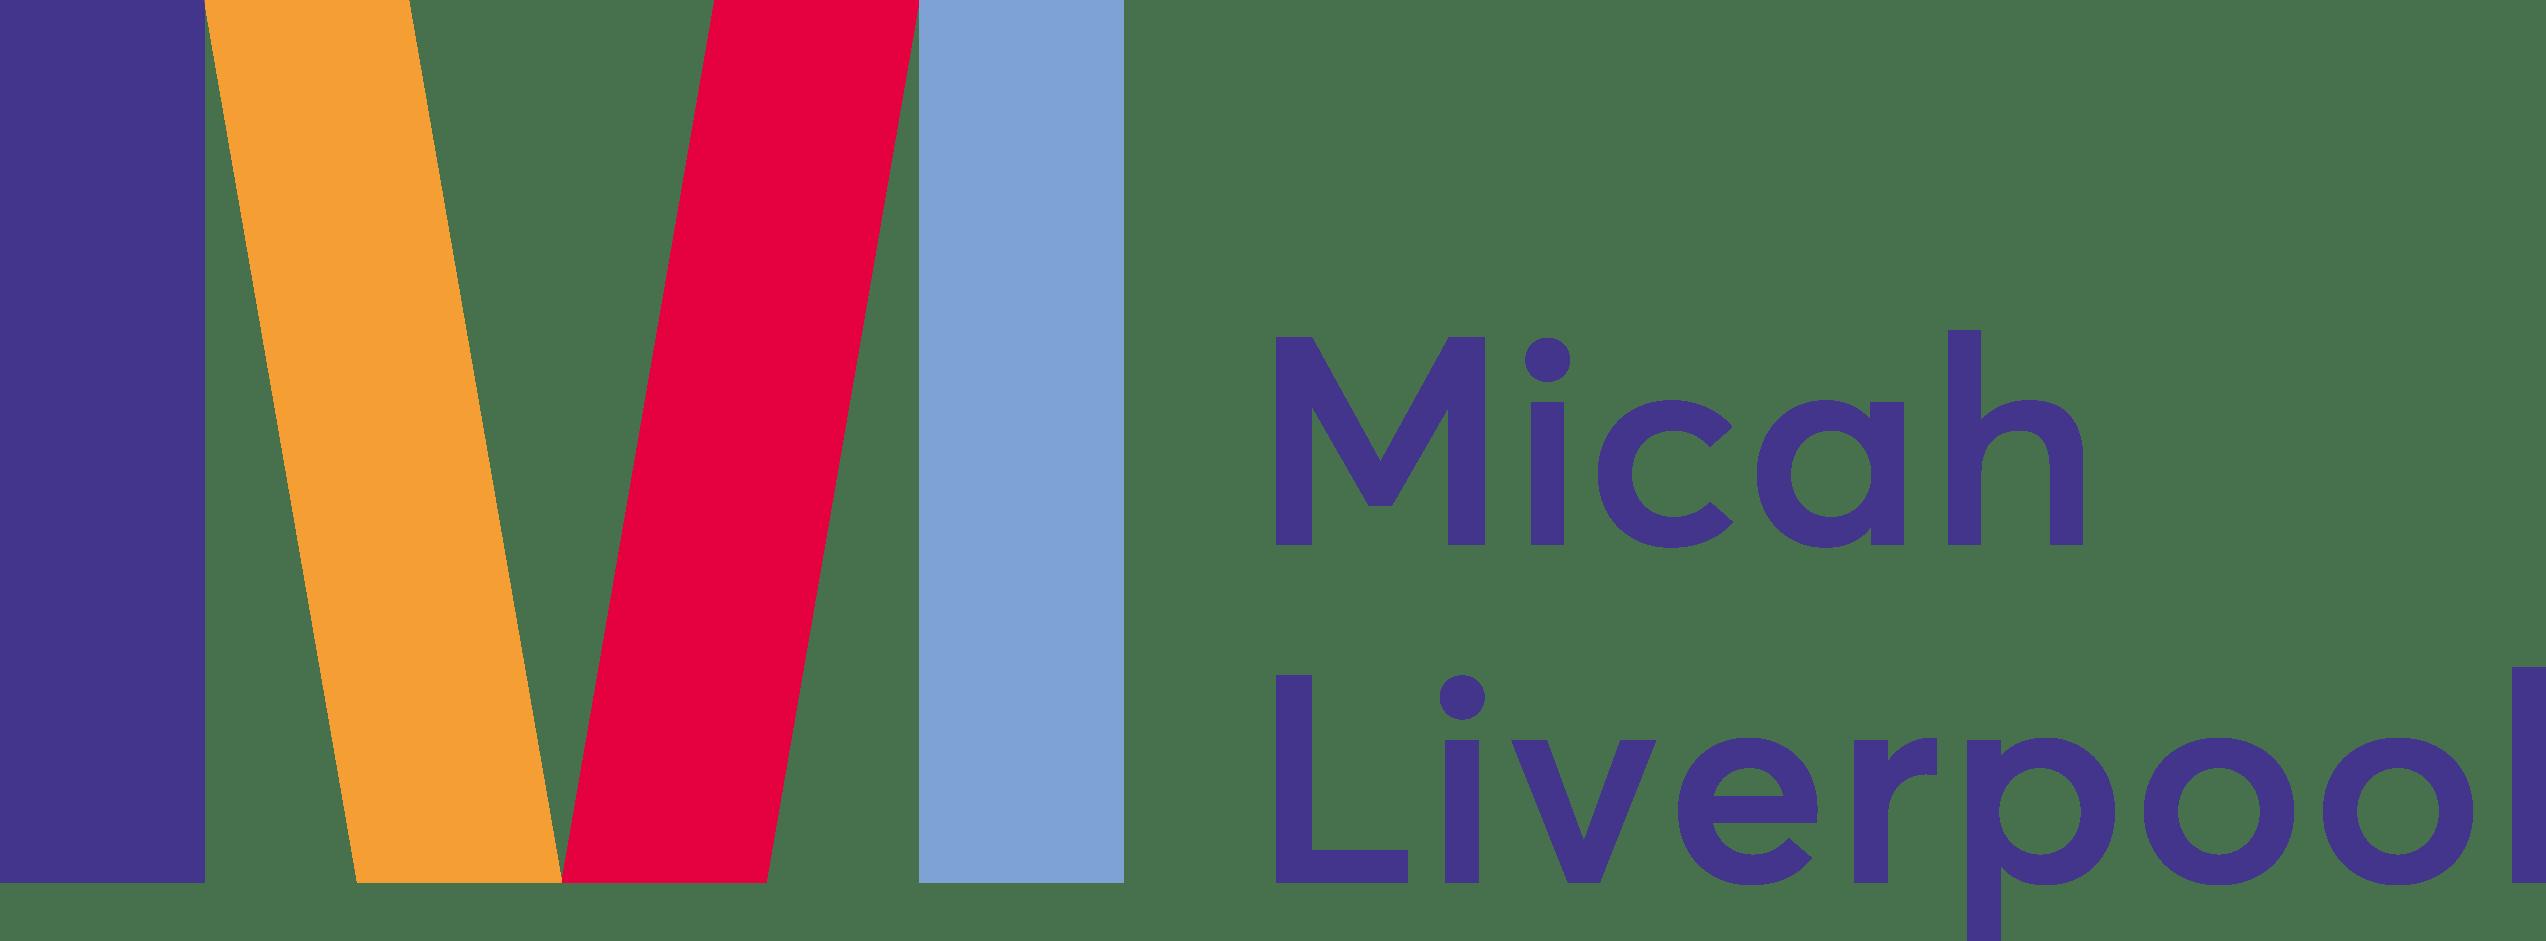 Micah Liverpool